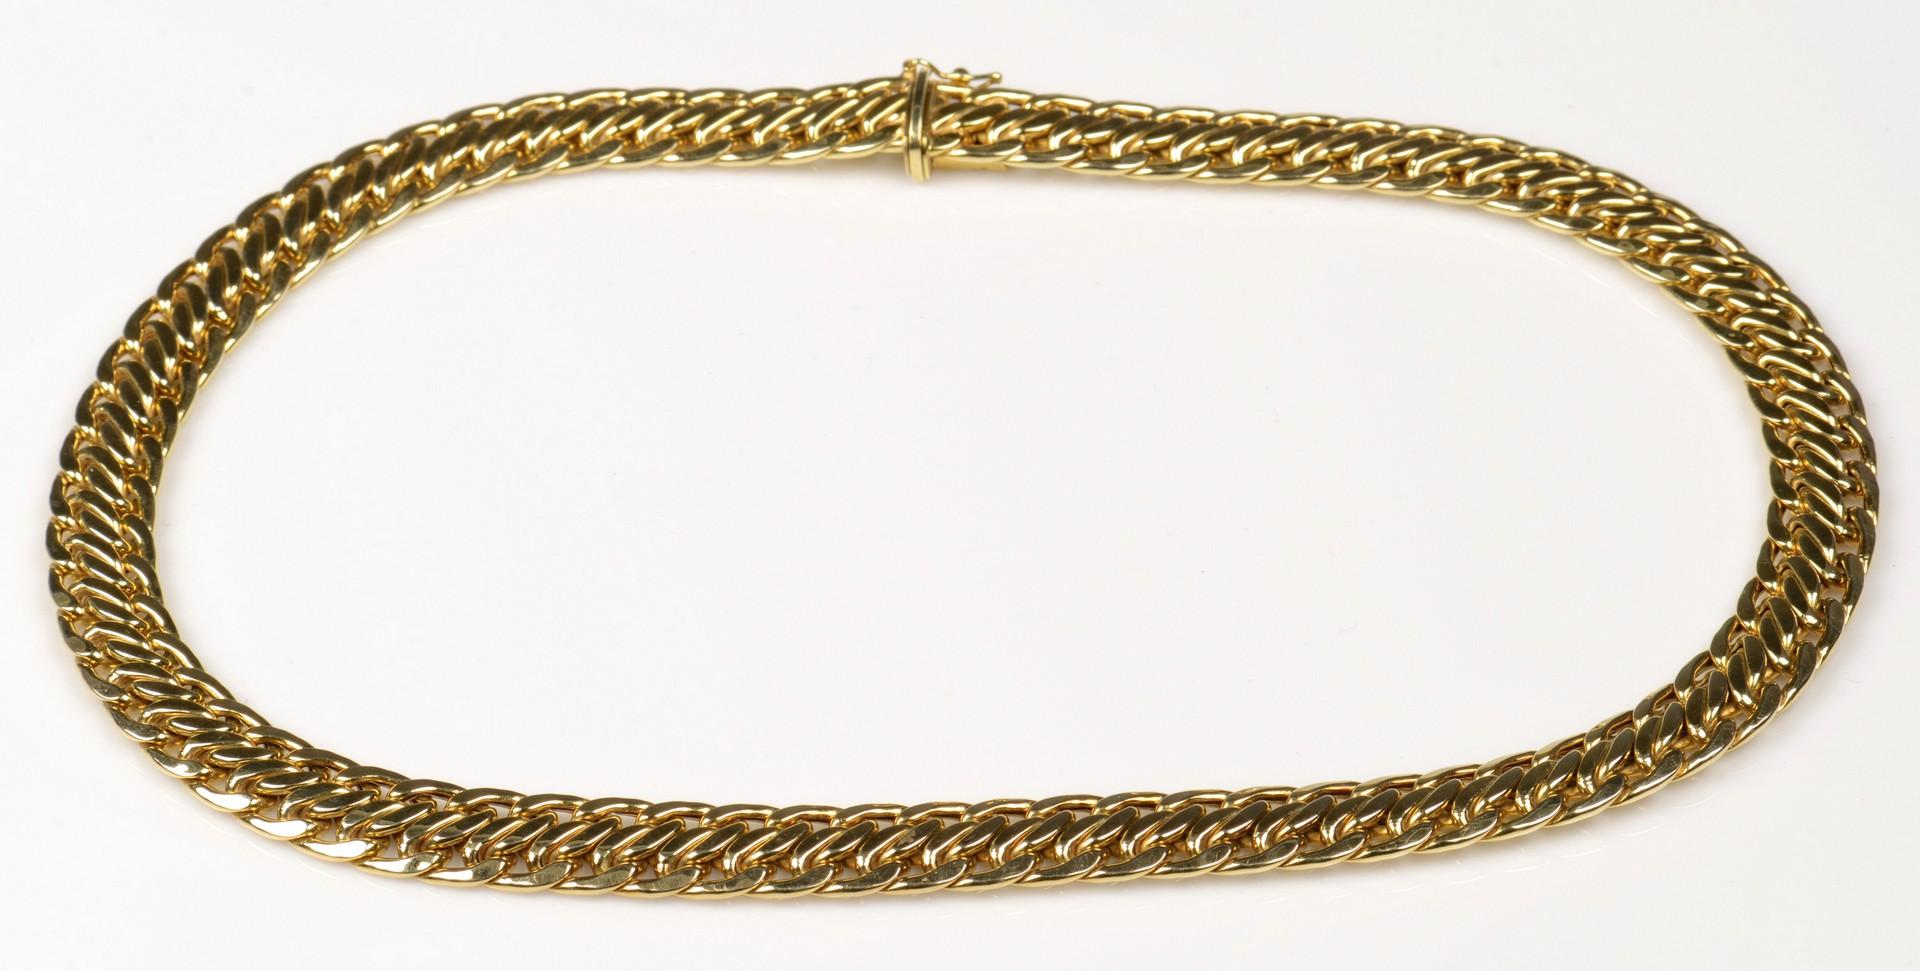 Lot 387: 14K Italian Serpentine Gold Necklace